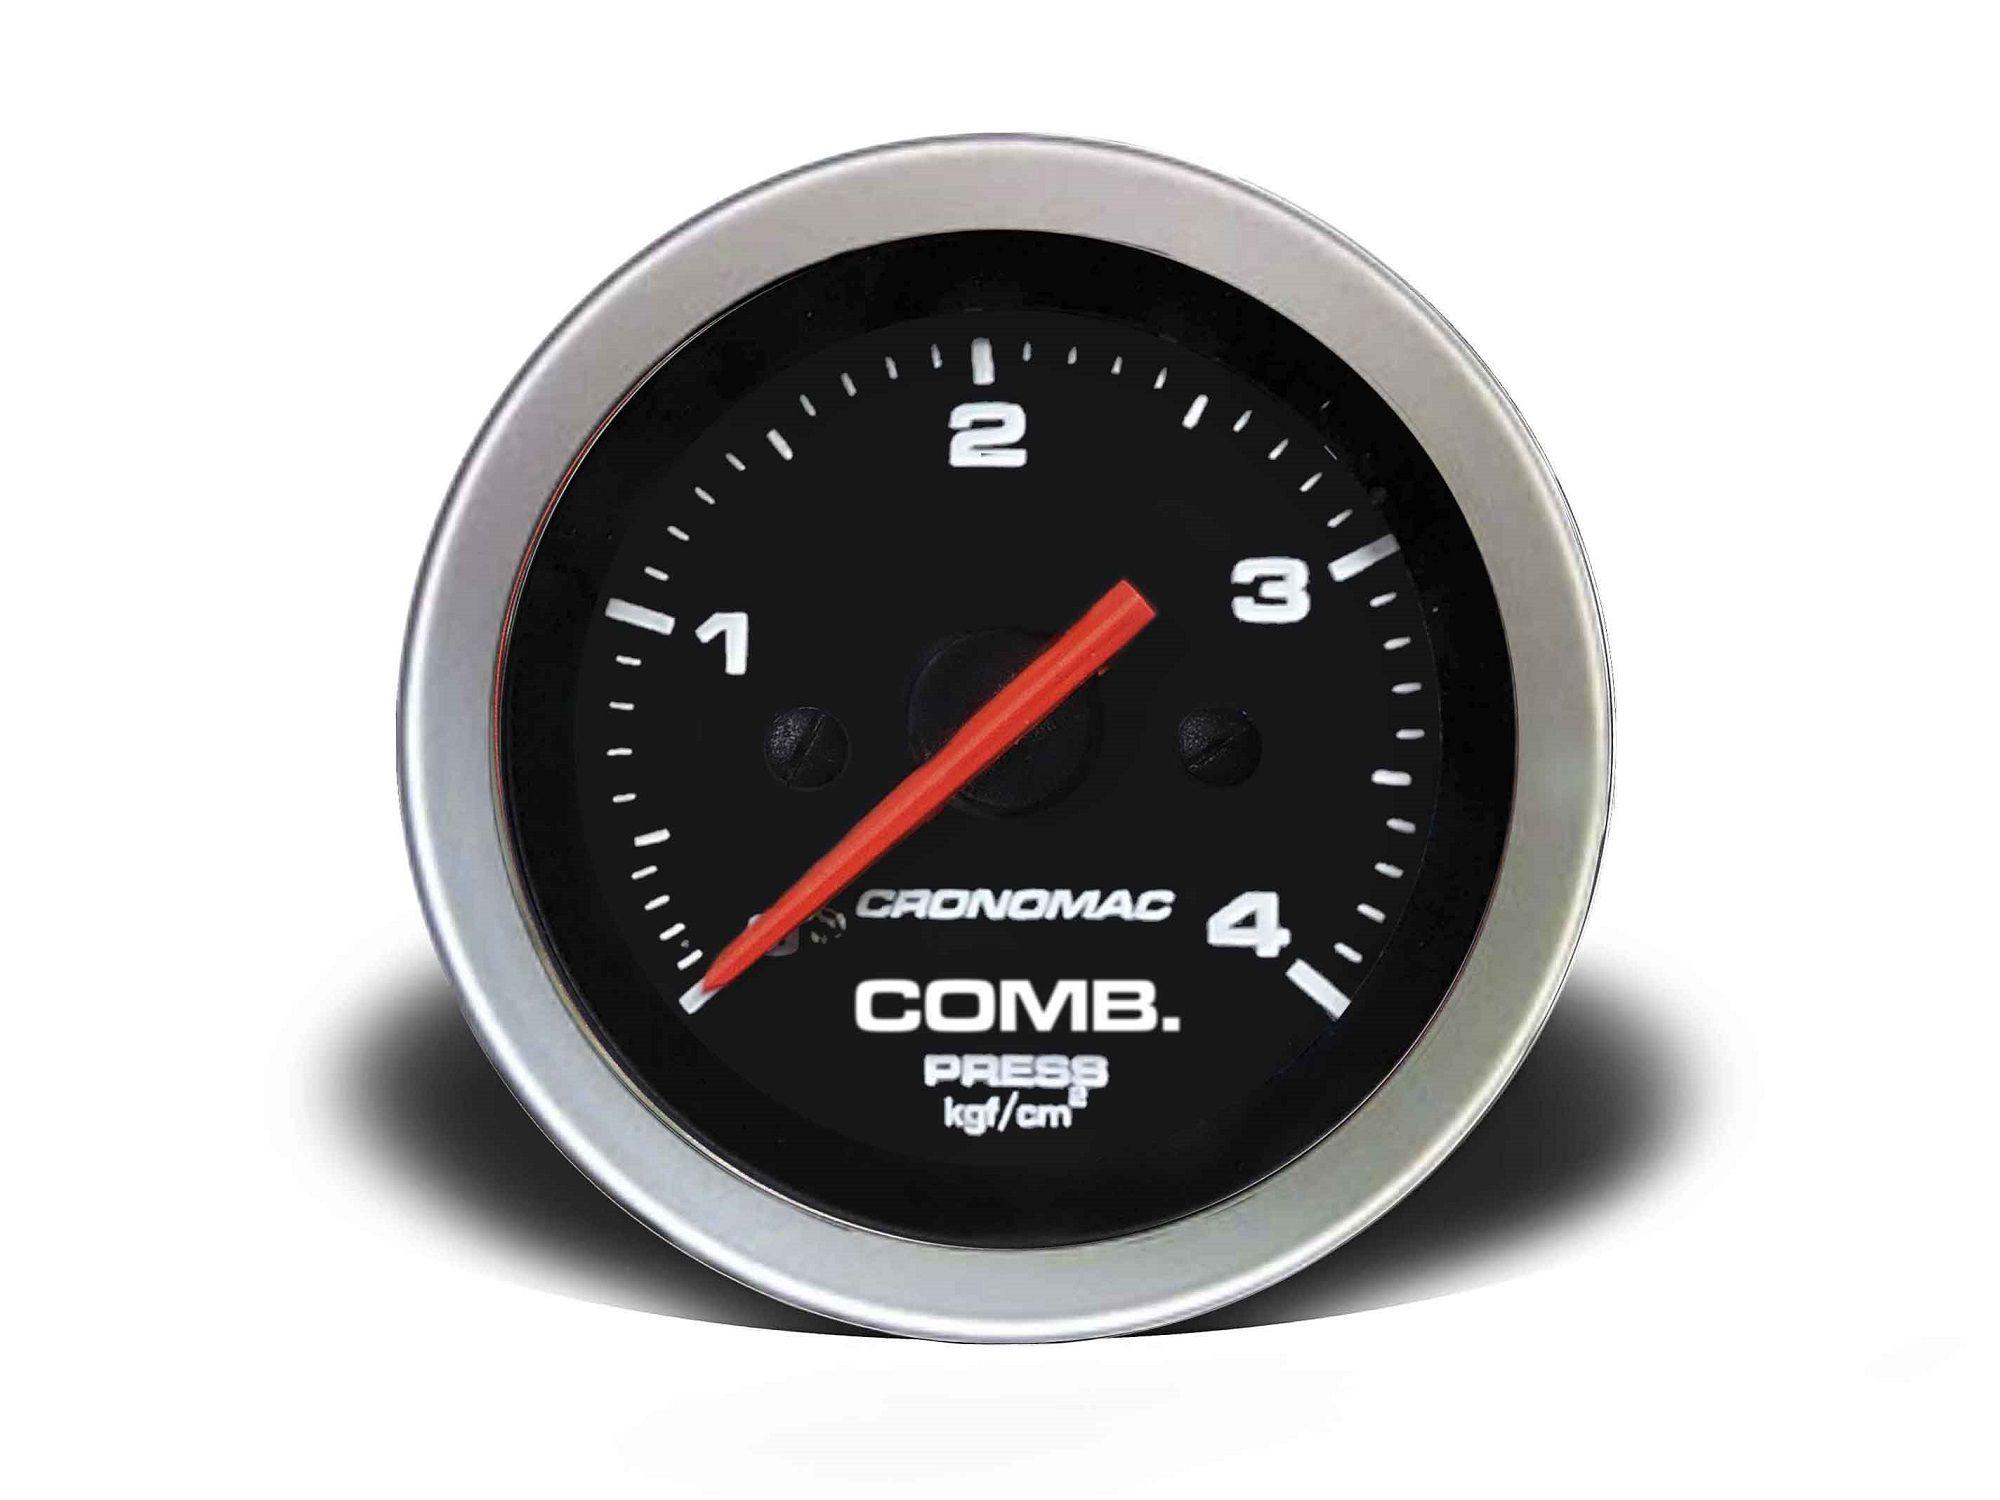 Relogio Pressao de Comb. 4kg Sport 52mm Cronomac